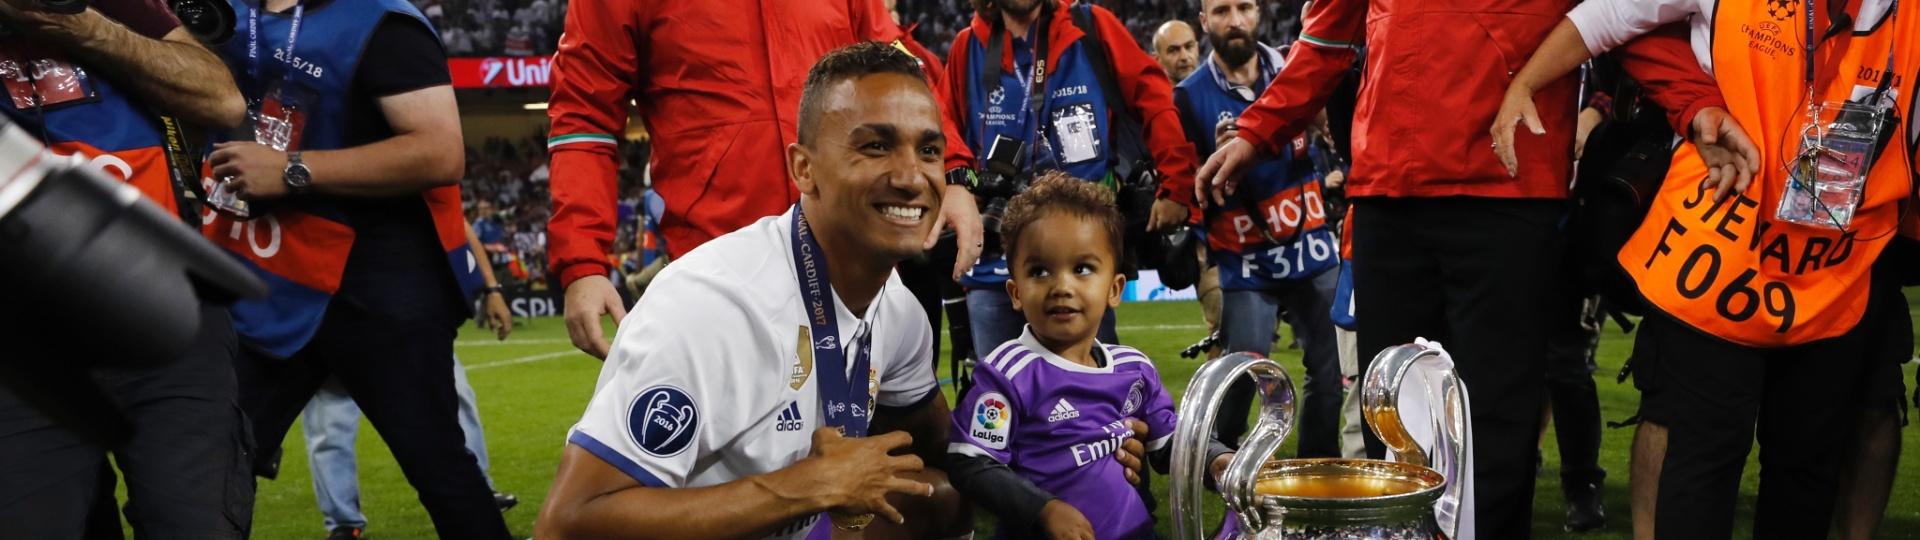 Danilo posa para foto ao lado da taça da Champions